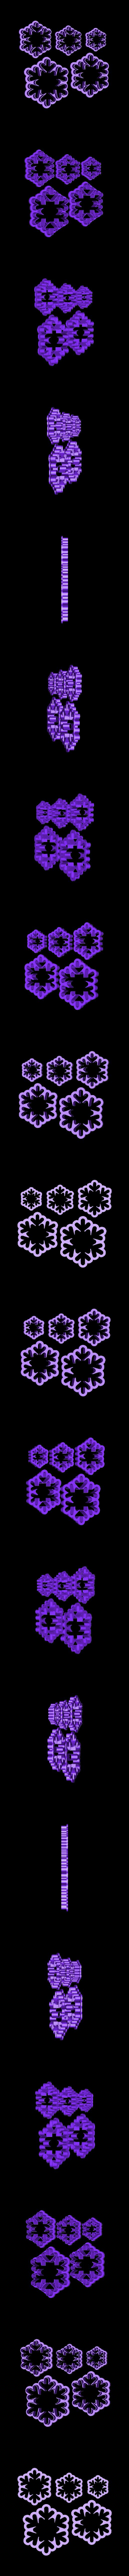 919 Copos de nieve set.stl Download STL file Snowflake cutter set • 3D printing object, juanchininaiara